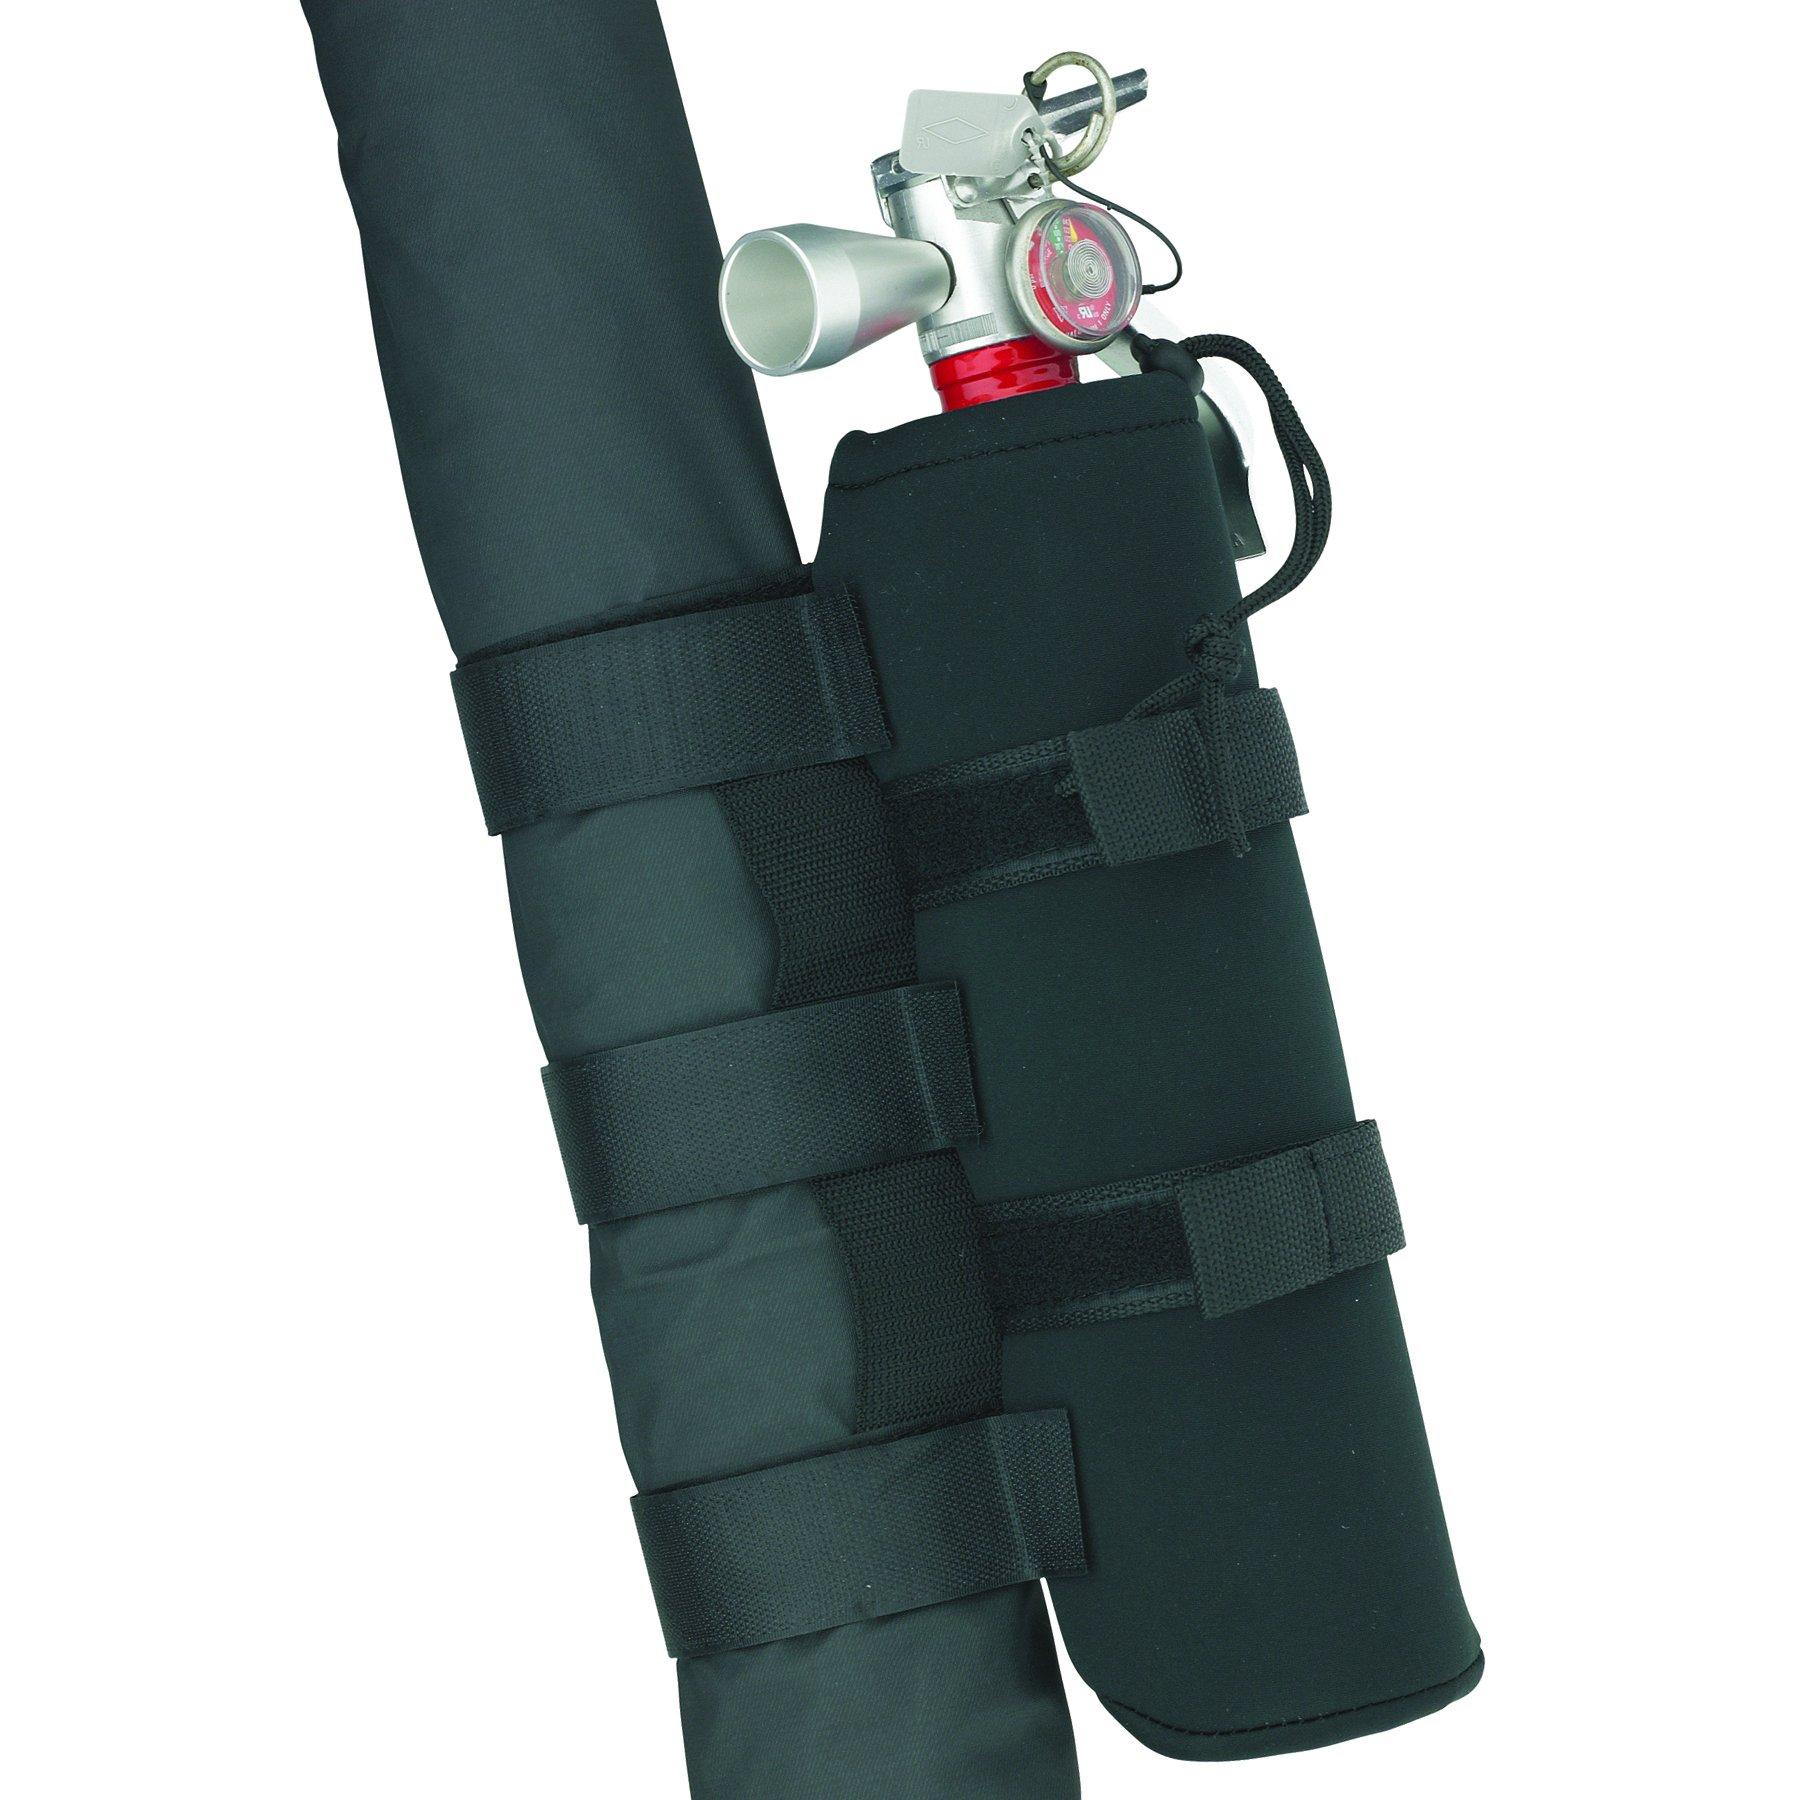 Smittybilt 769540 Black Roll Bar Holder for 2.5 lbs. Fire Extinguisher by Smittybilt